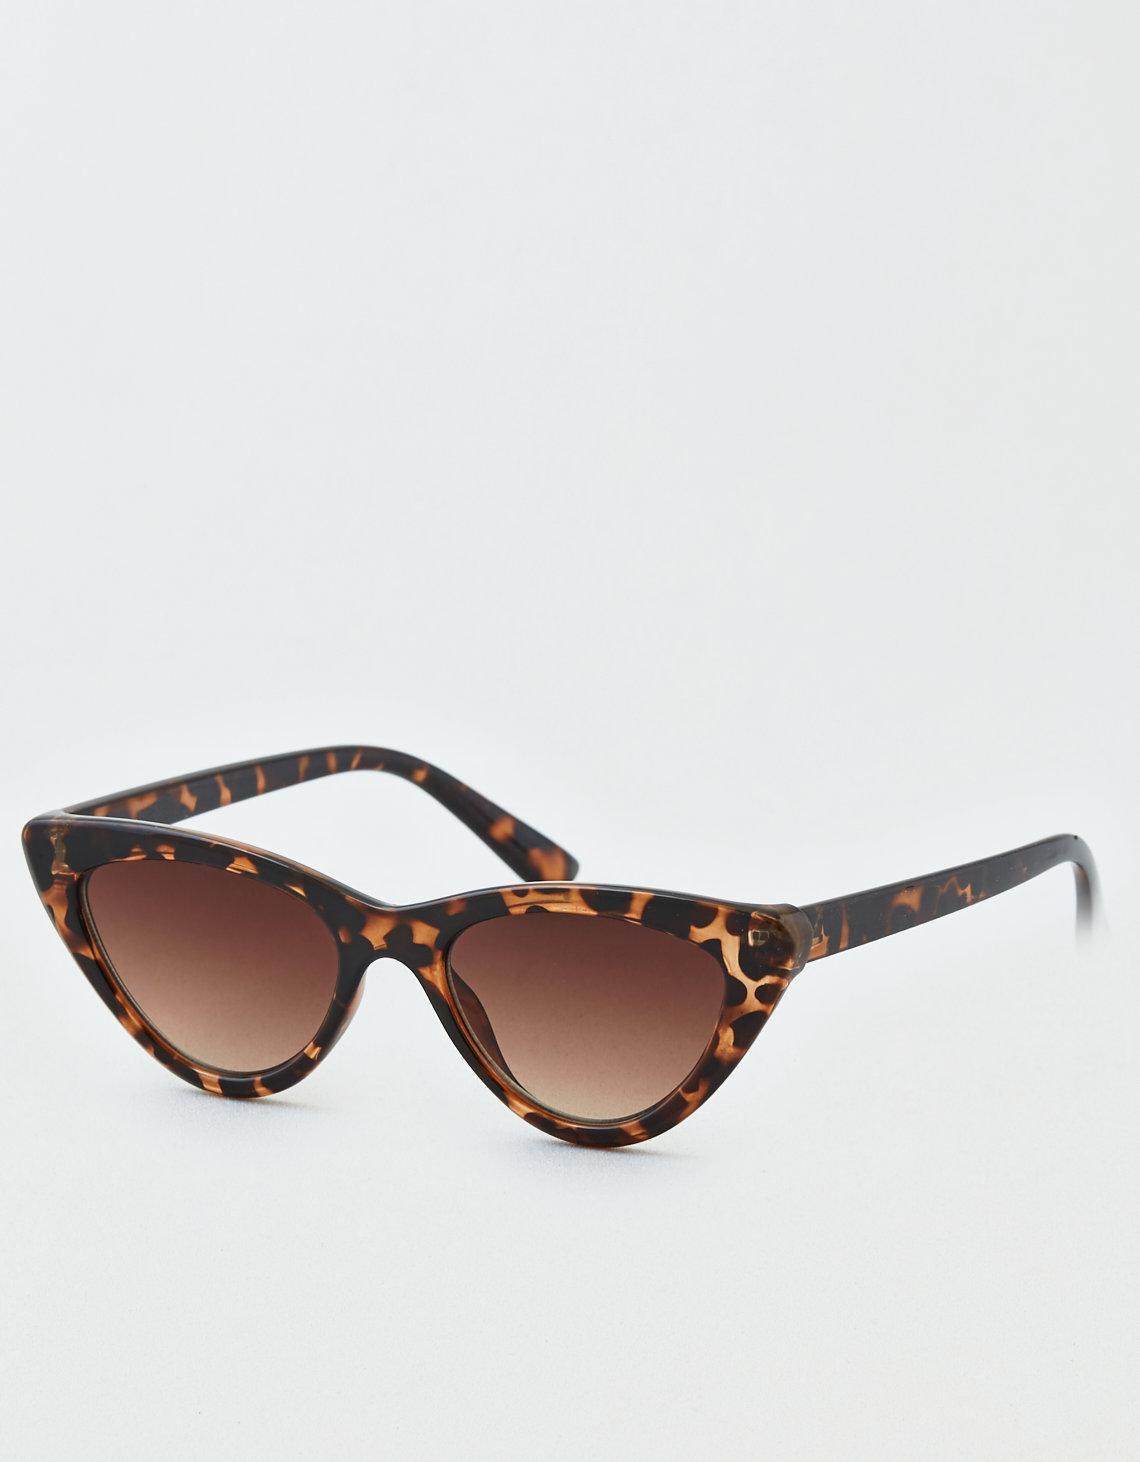 Black Small Cat Eye Skinny Sunglasses Pretty Little Thing q3rgOjg